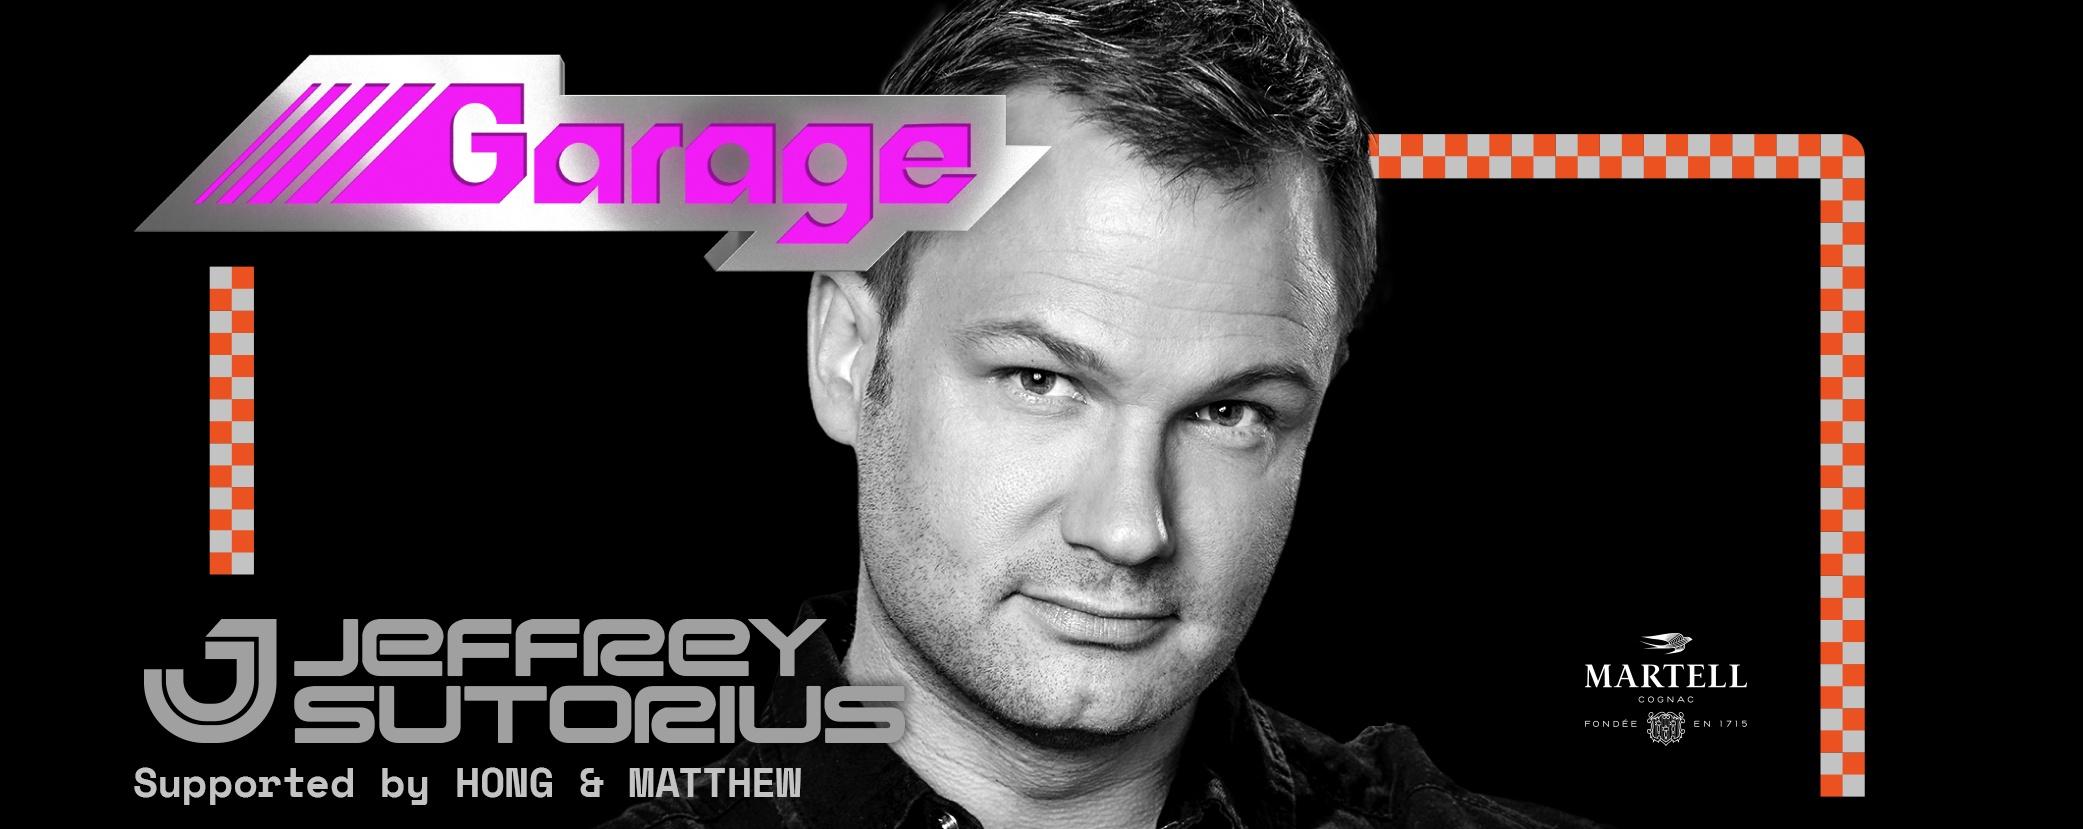 Martell Red Barrel presents Garage ft. Jeffrey Sutorius (Zouk F1 Weekend)